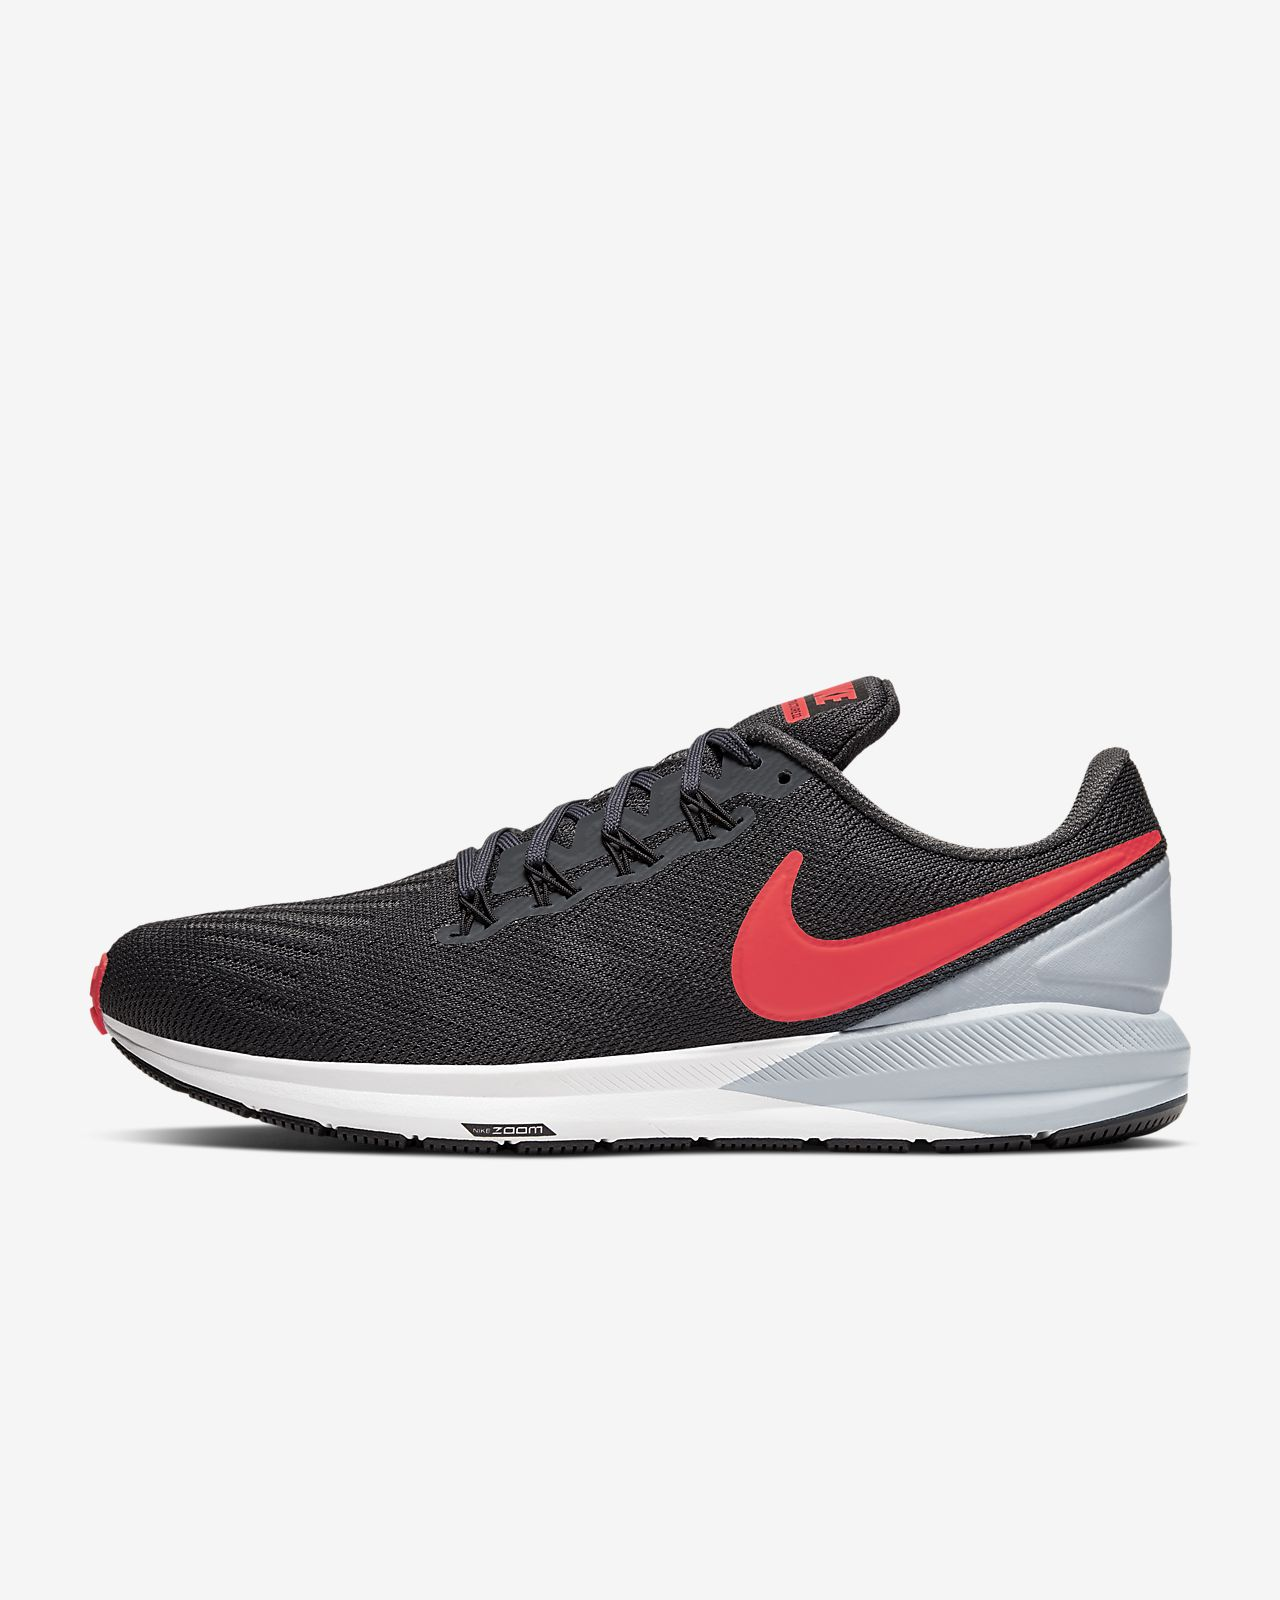 Nike Air Zoom Structure 22 Herren-Laufschuh